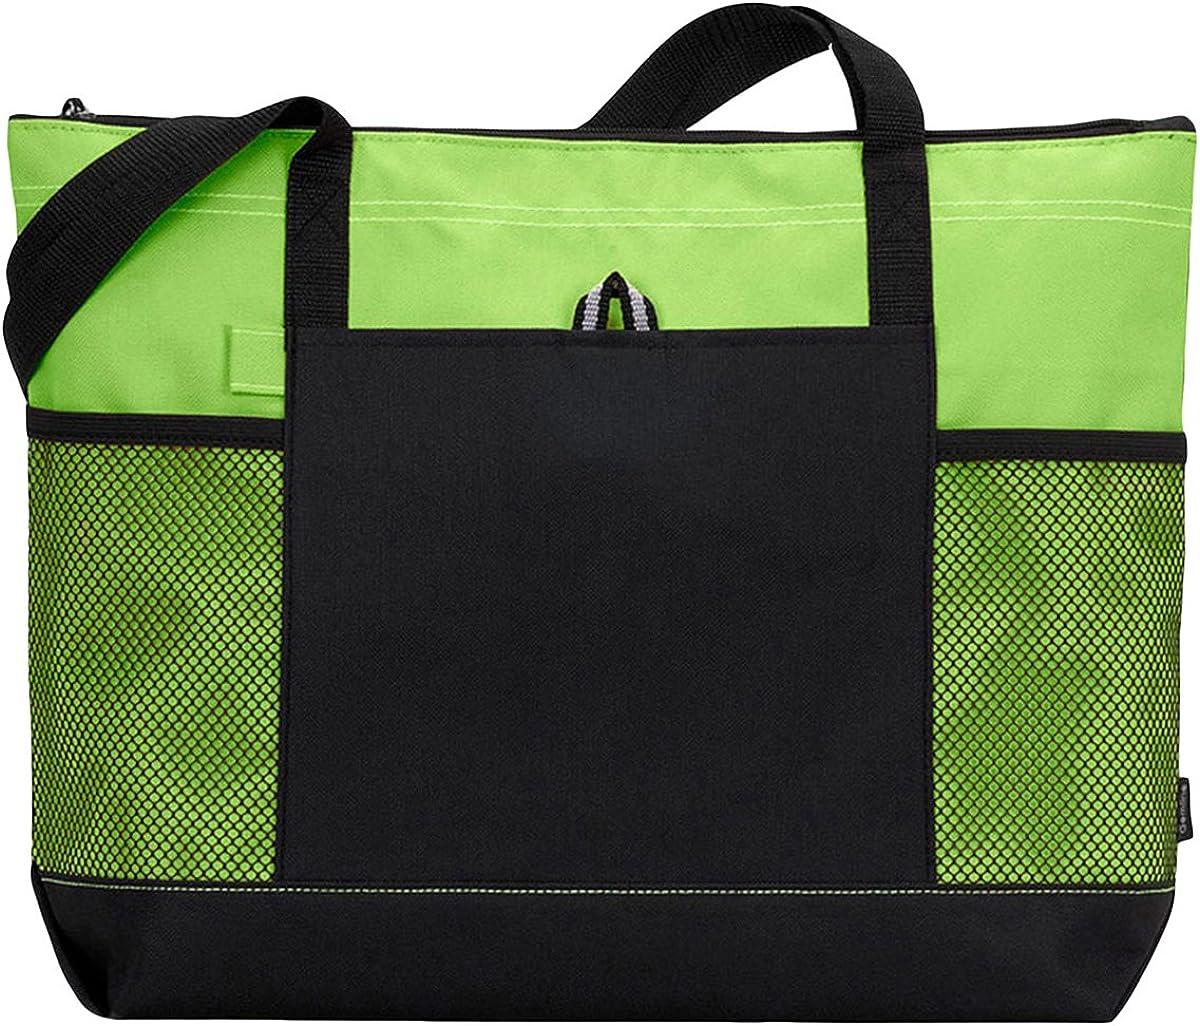 Gemline Select Zippered Tote Bag 1100 Apple Green